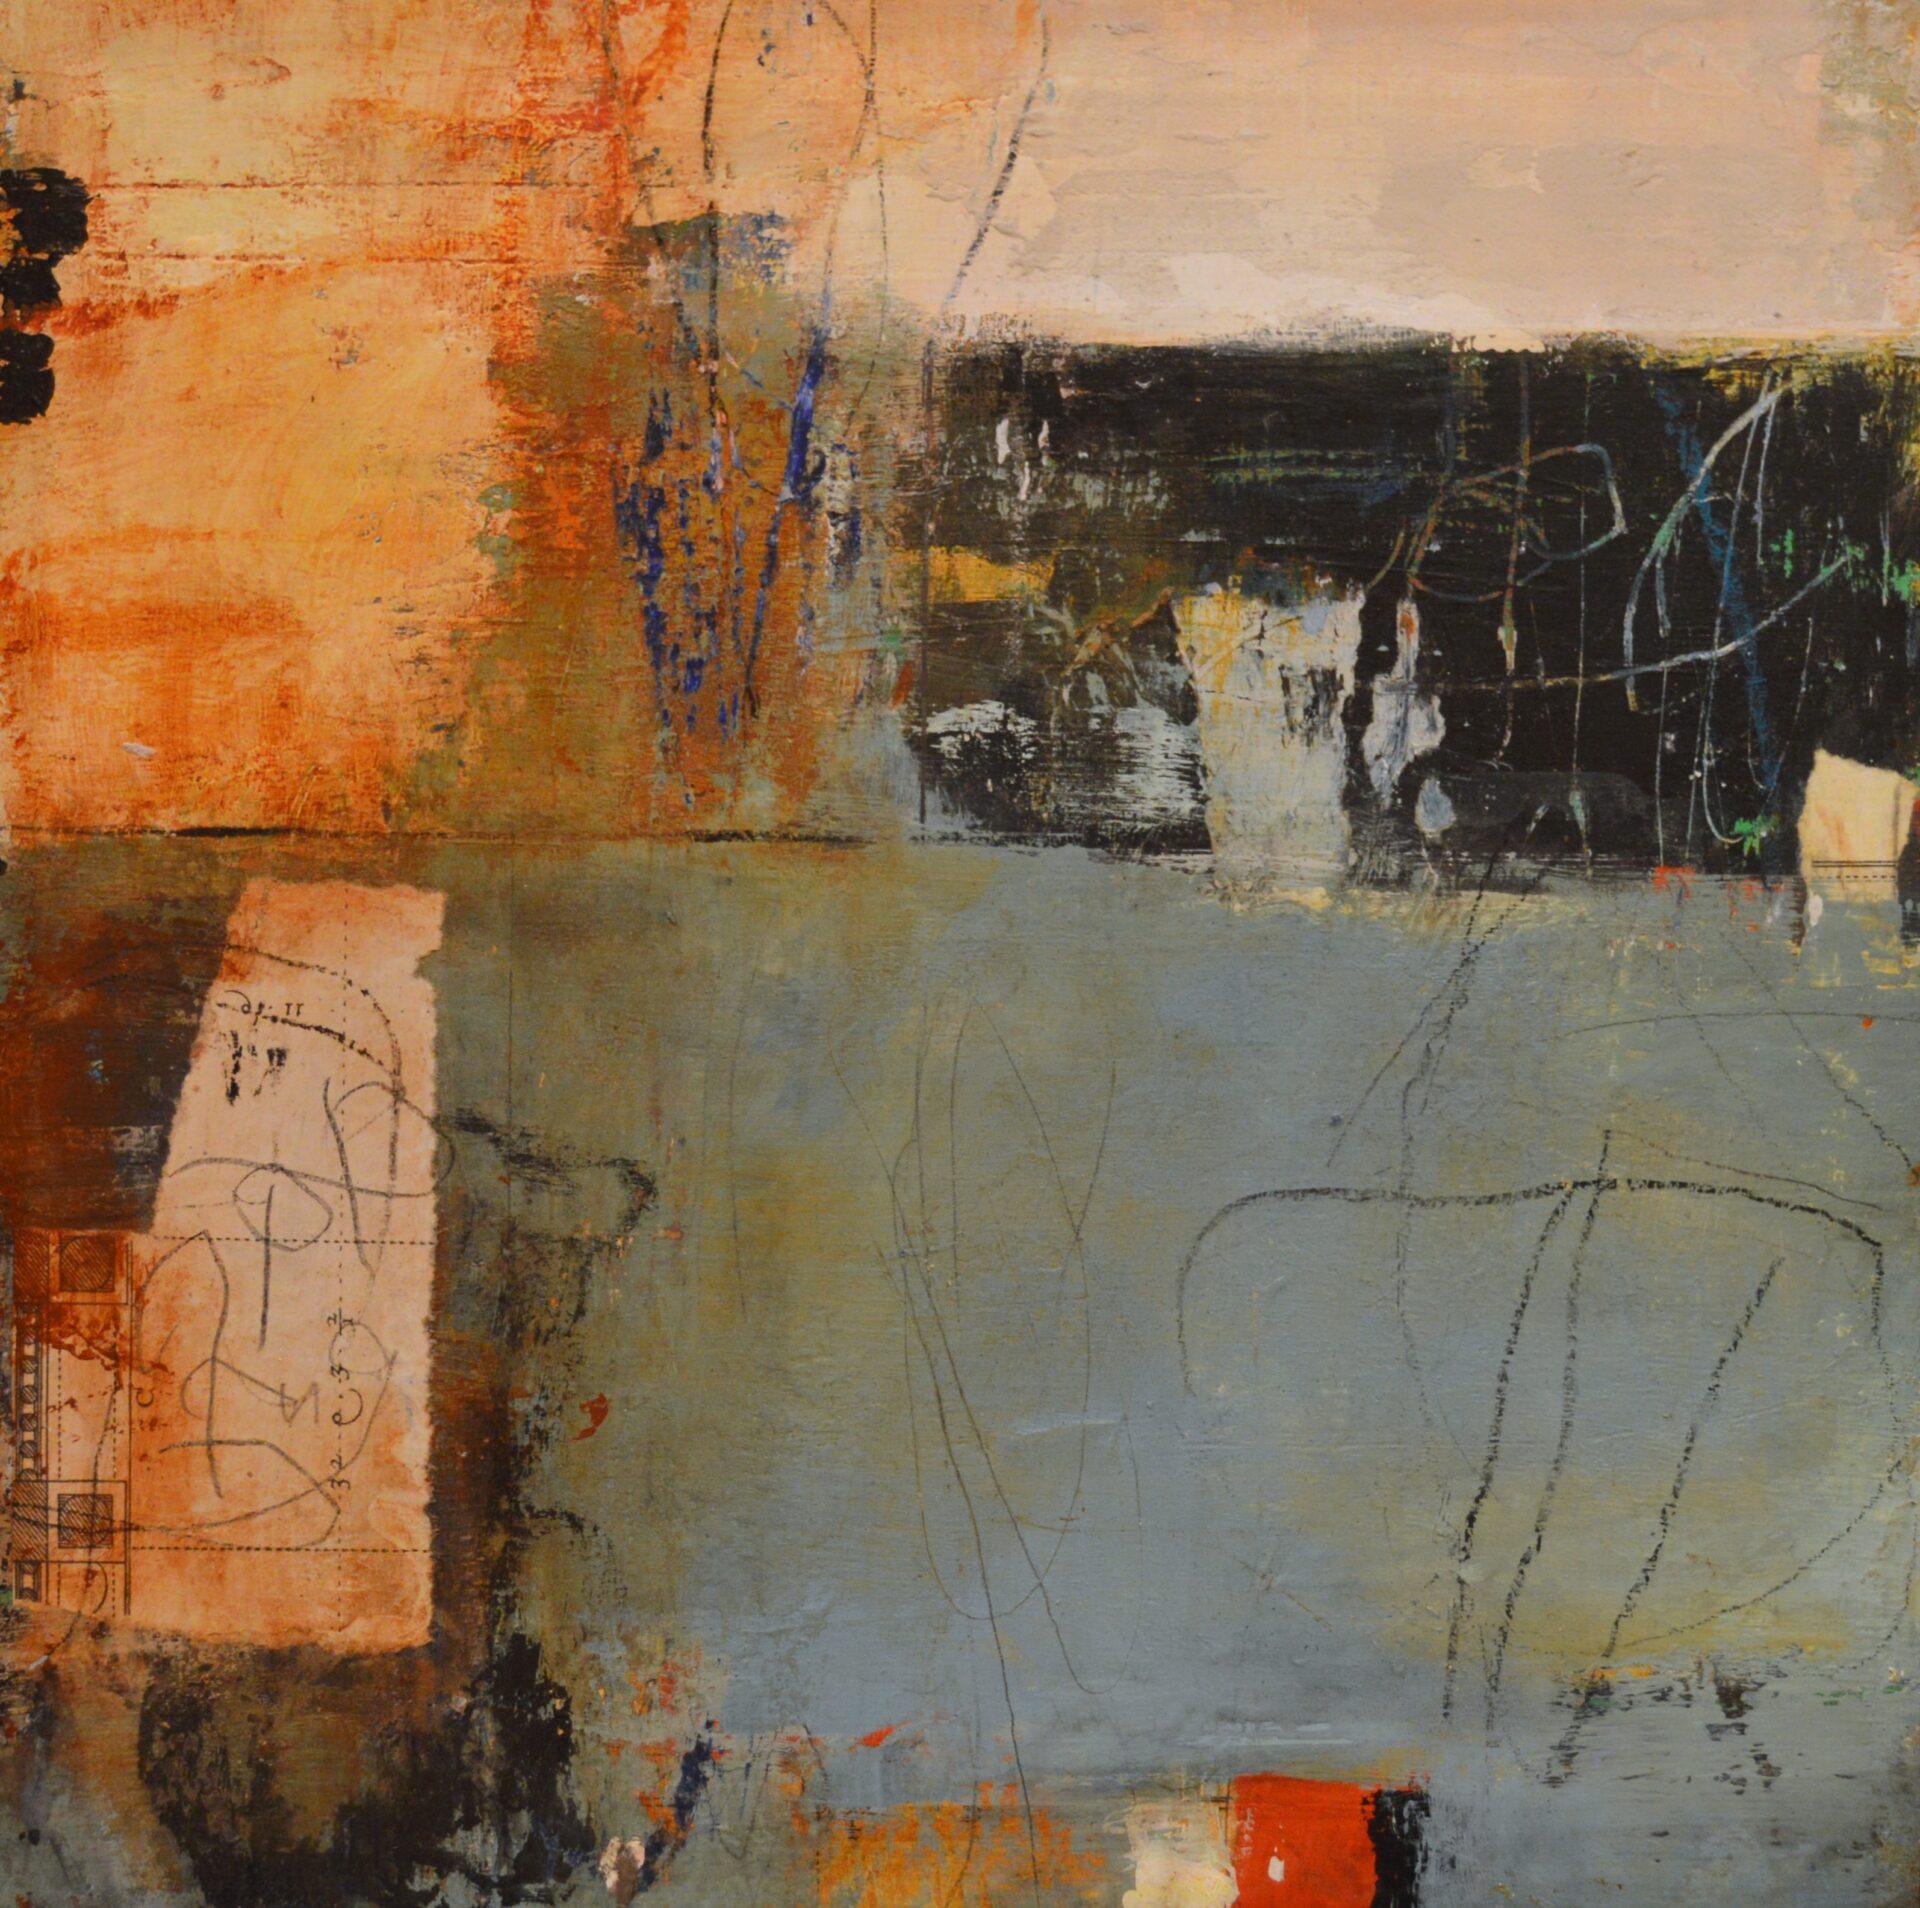 Allison B. Cooke - Convergenza